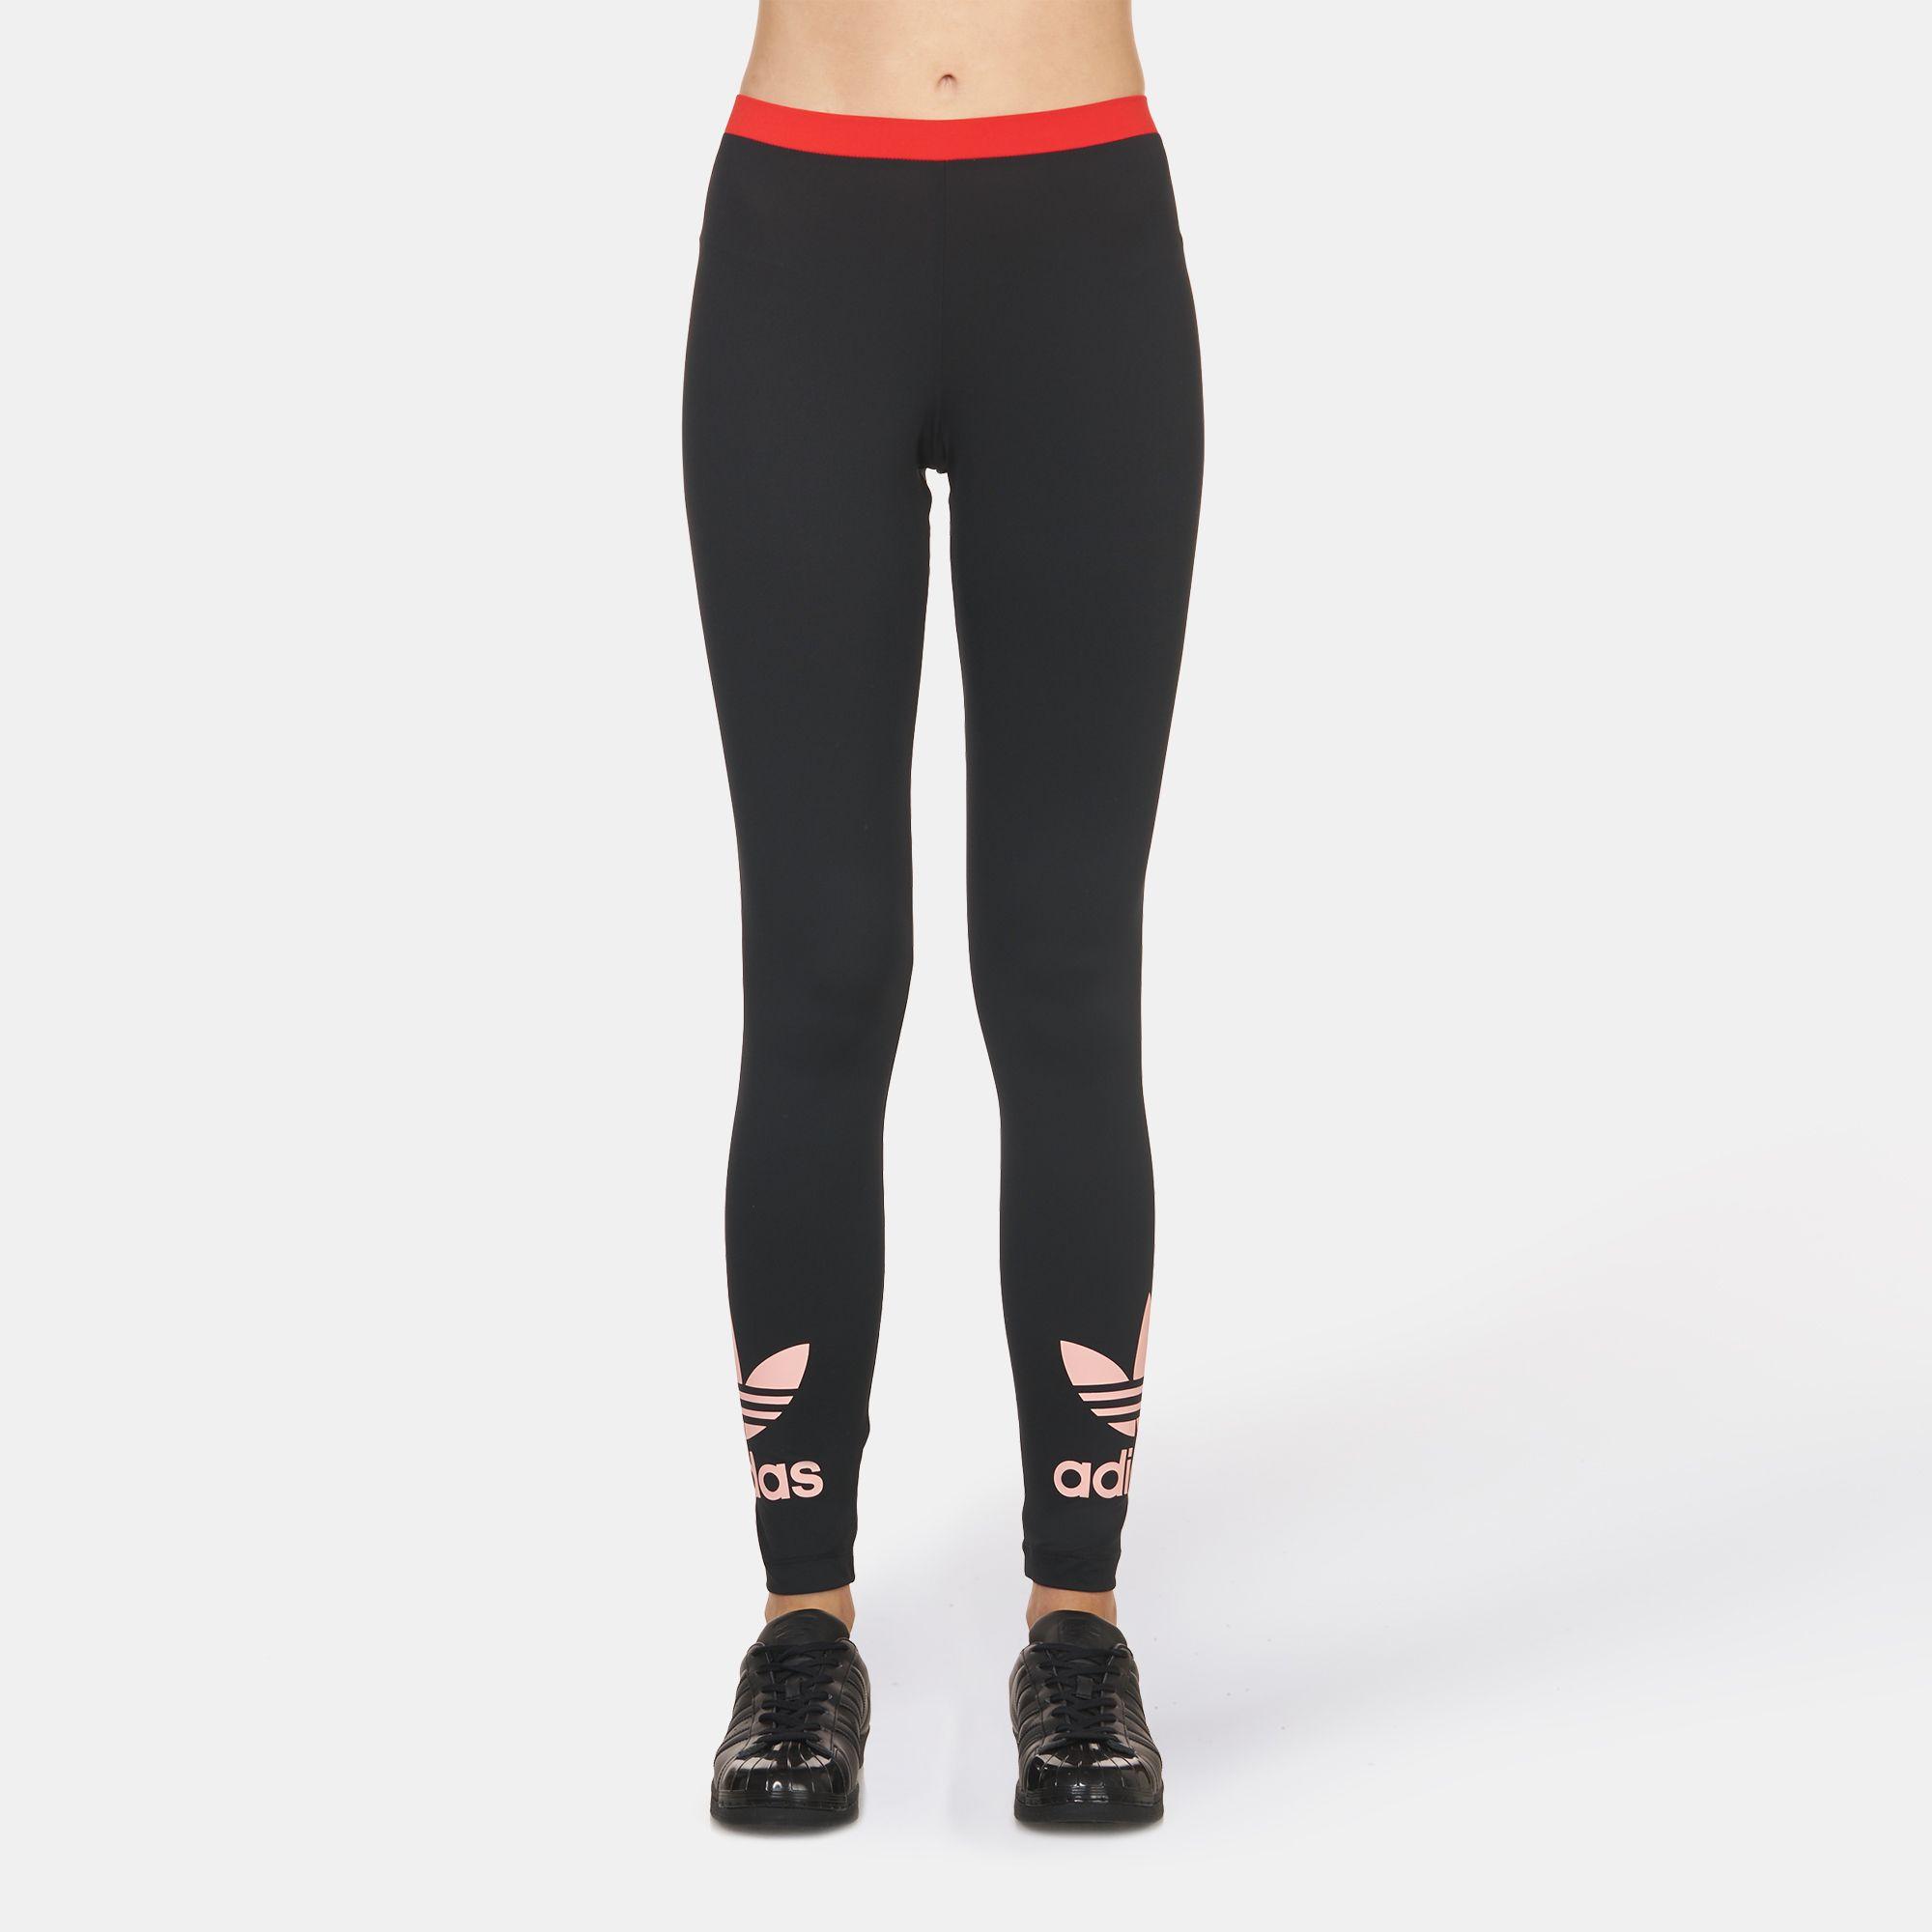 df0af6d43cffee Shop Black adidas Originals Trefoil Leggings for Womens by adidas ...